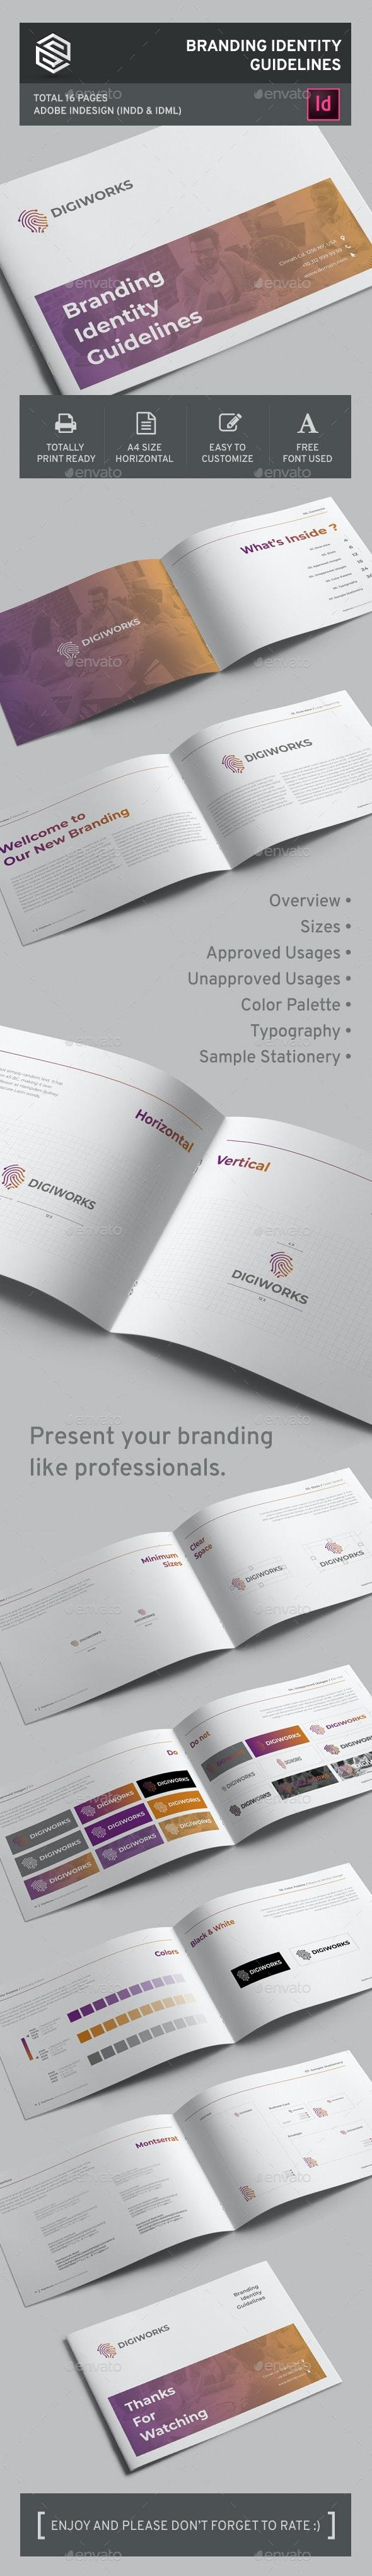 Branding Identity Guidelines - Corporate Brochures